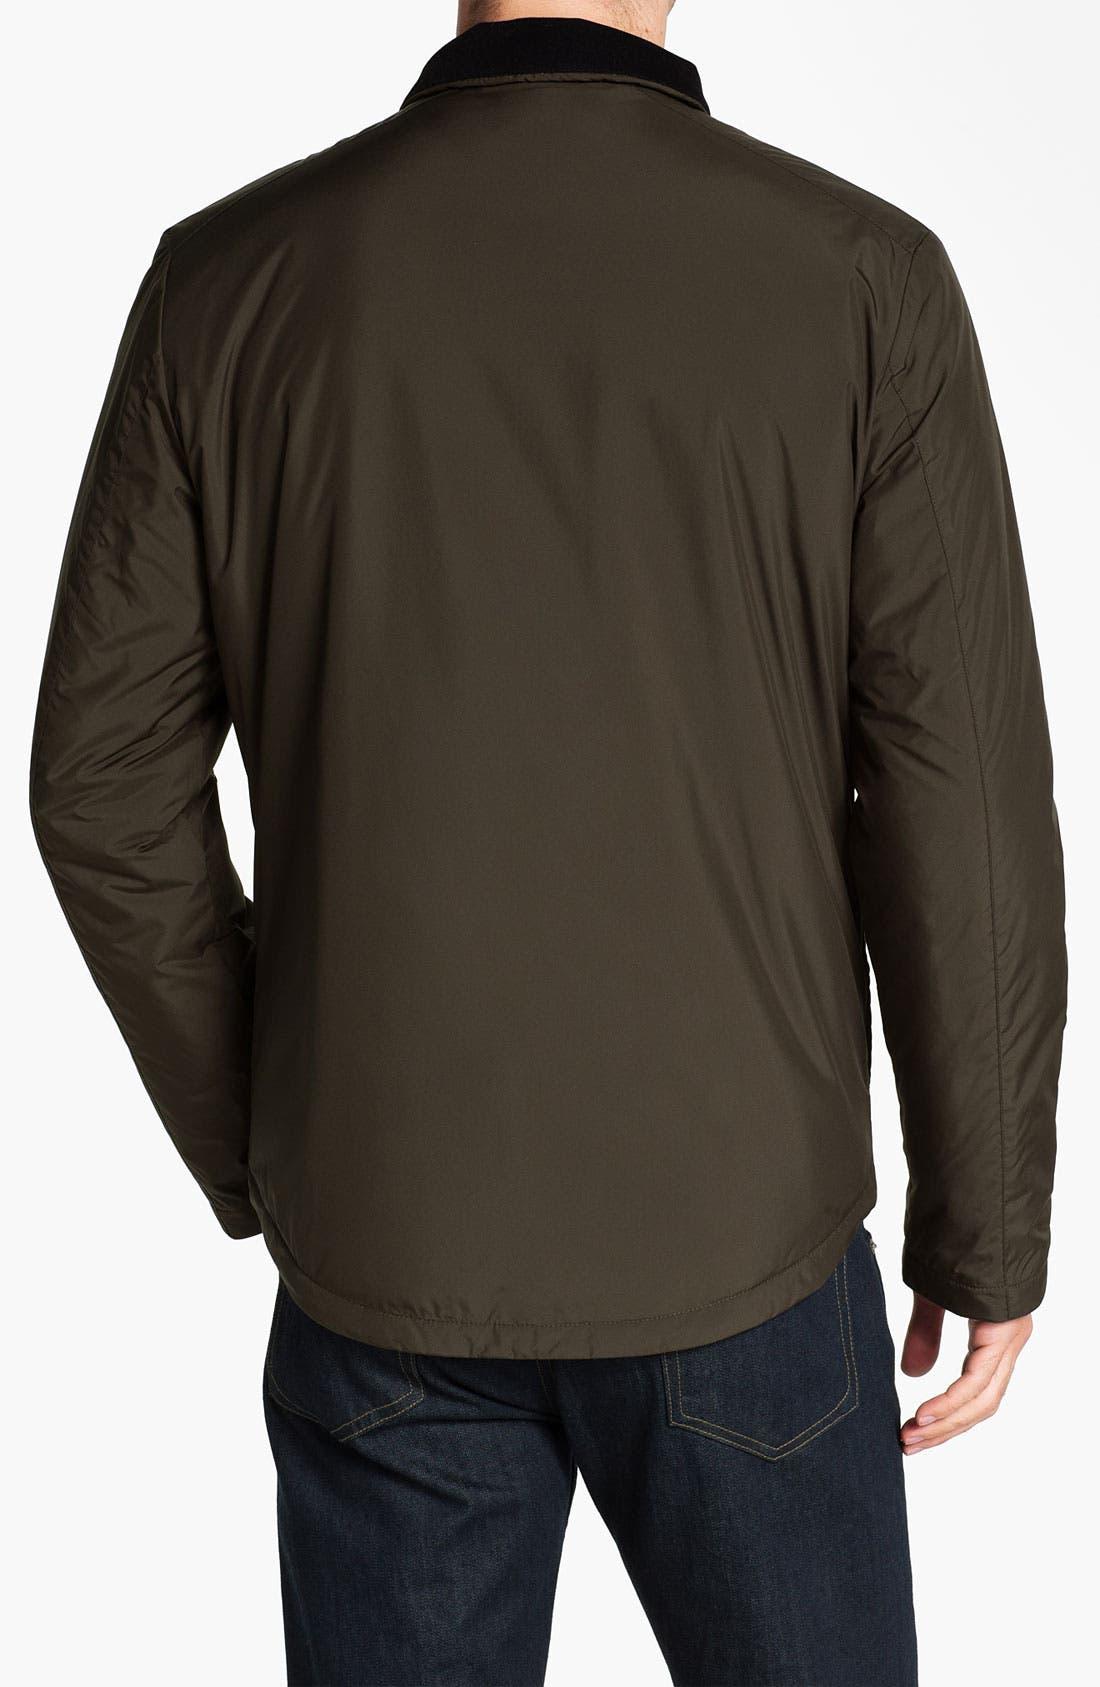 Alternate Image 2  - Victorinox Swiss Army® 'Bernin' Insulated Jacket (Online Only)